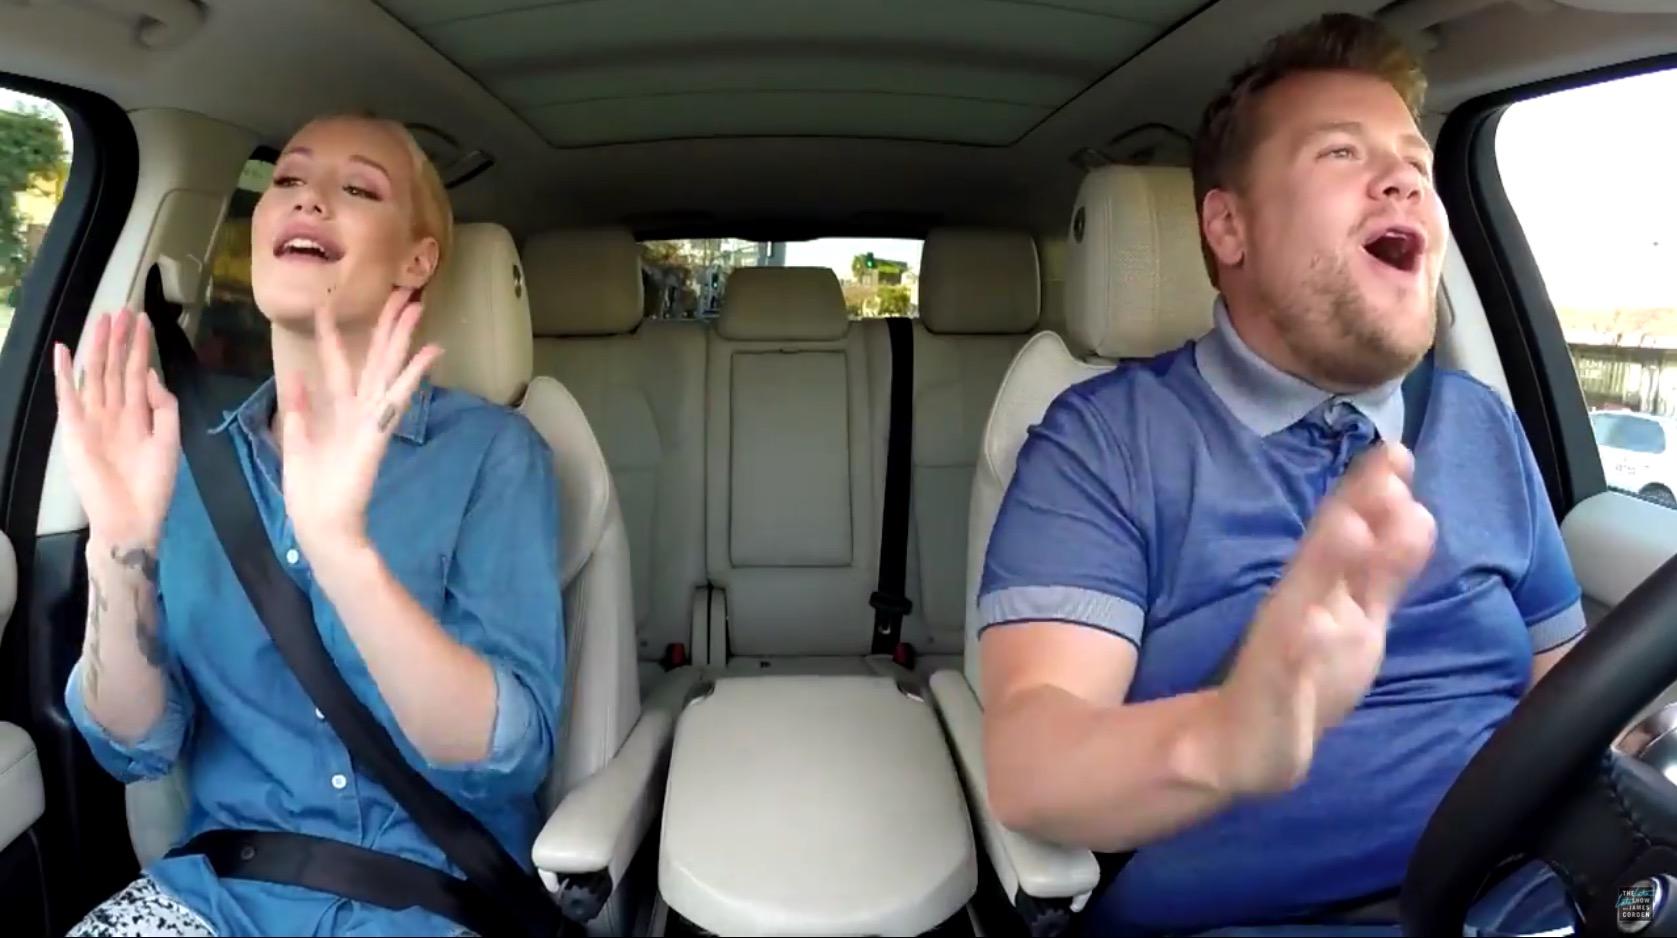 Iggy Azalea Gets The Carpool Karaoke Gig In The Late Late Show With